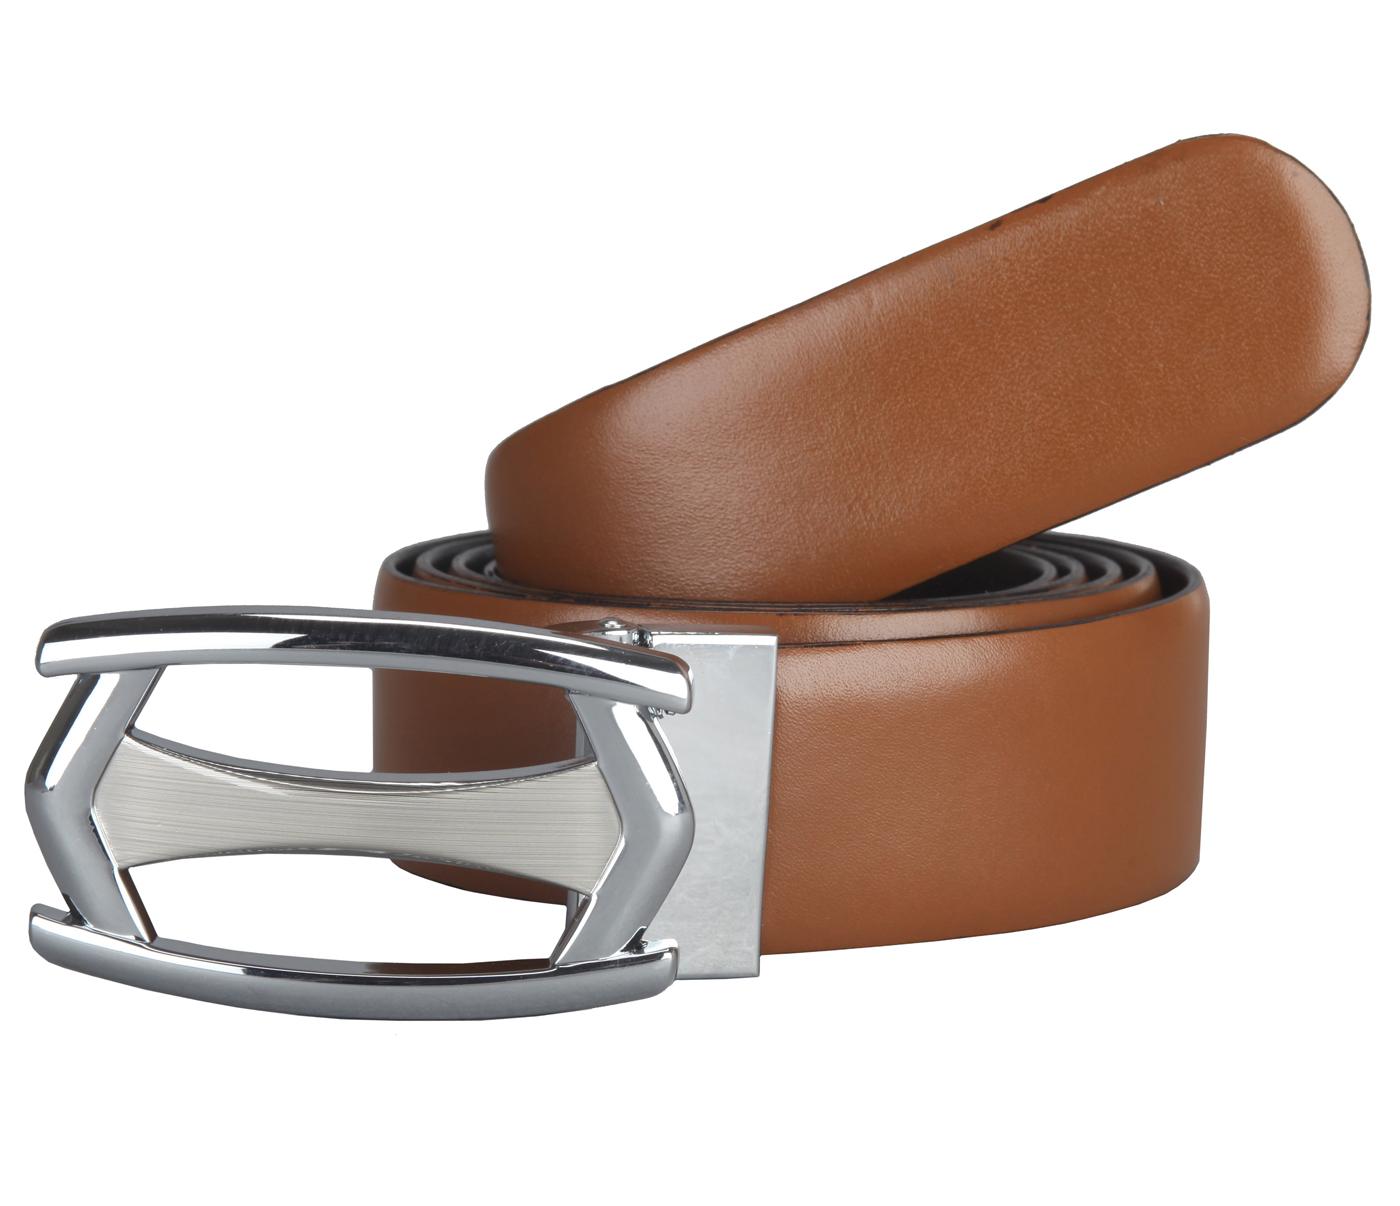 BL137--Men's reversible belt in Genuine Leather - Black/Tan